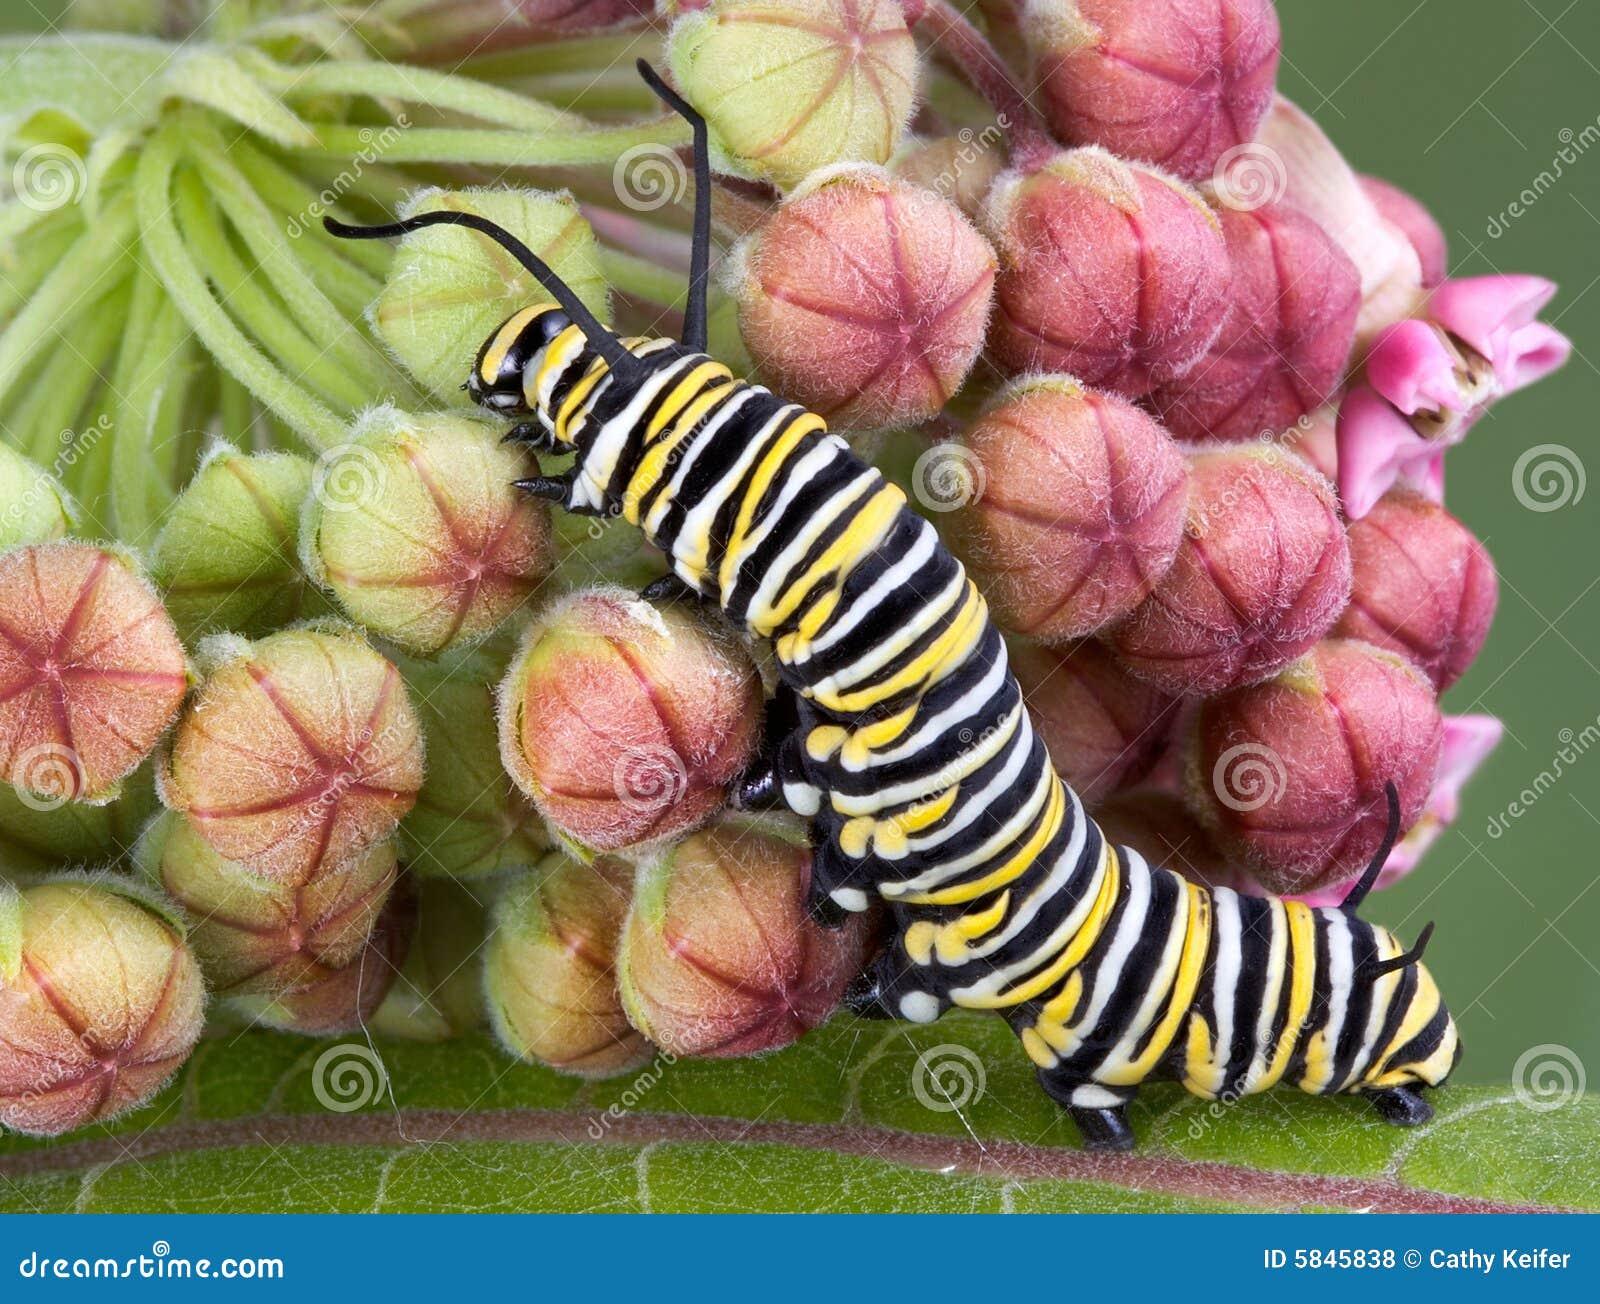 Monarch caterpillar on milkweed b